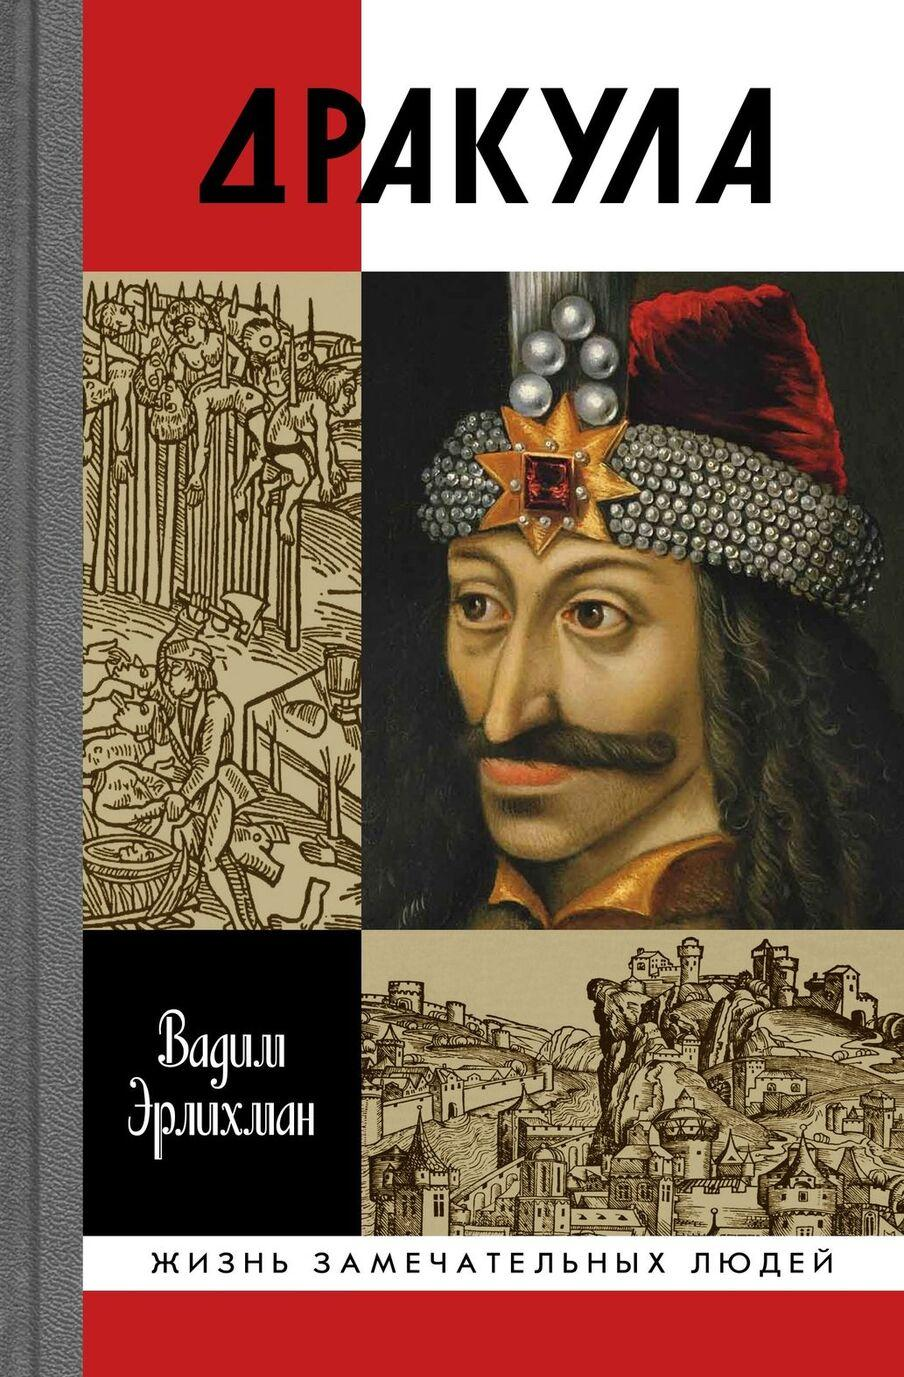 Drakula | Erlikhman Vadim Viktorovich